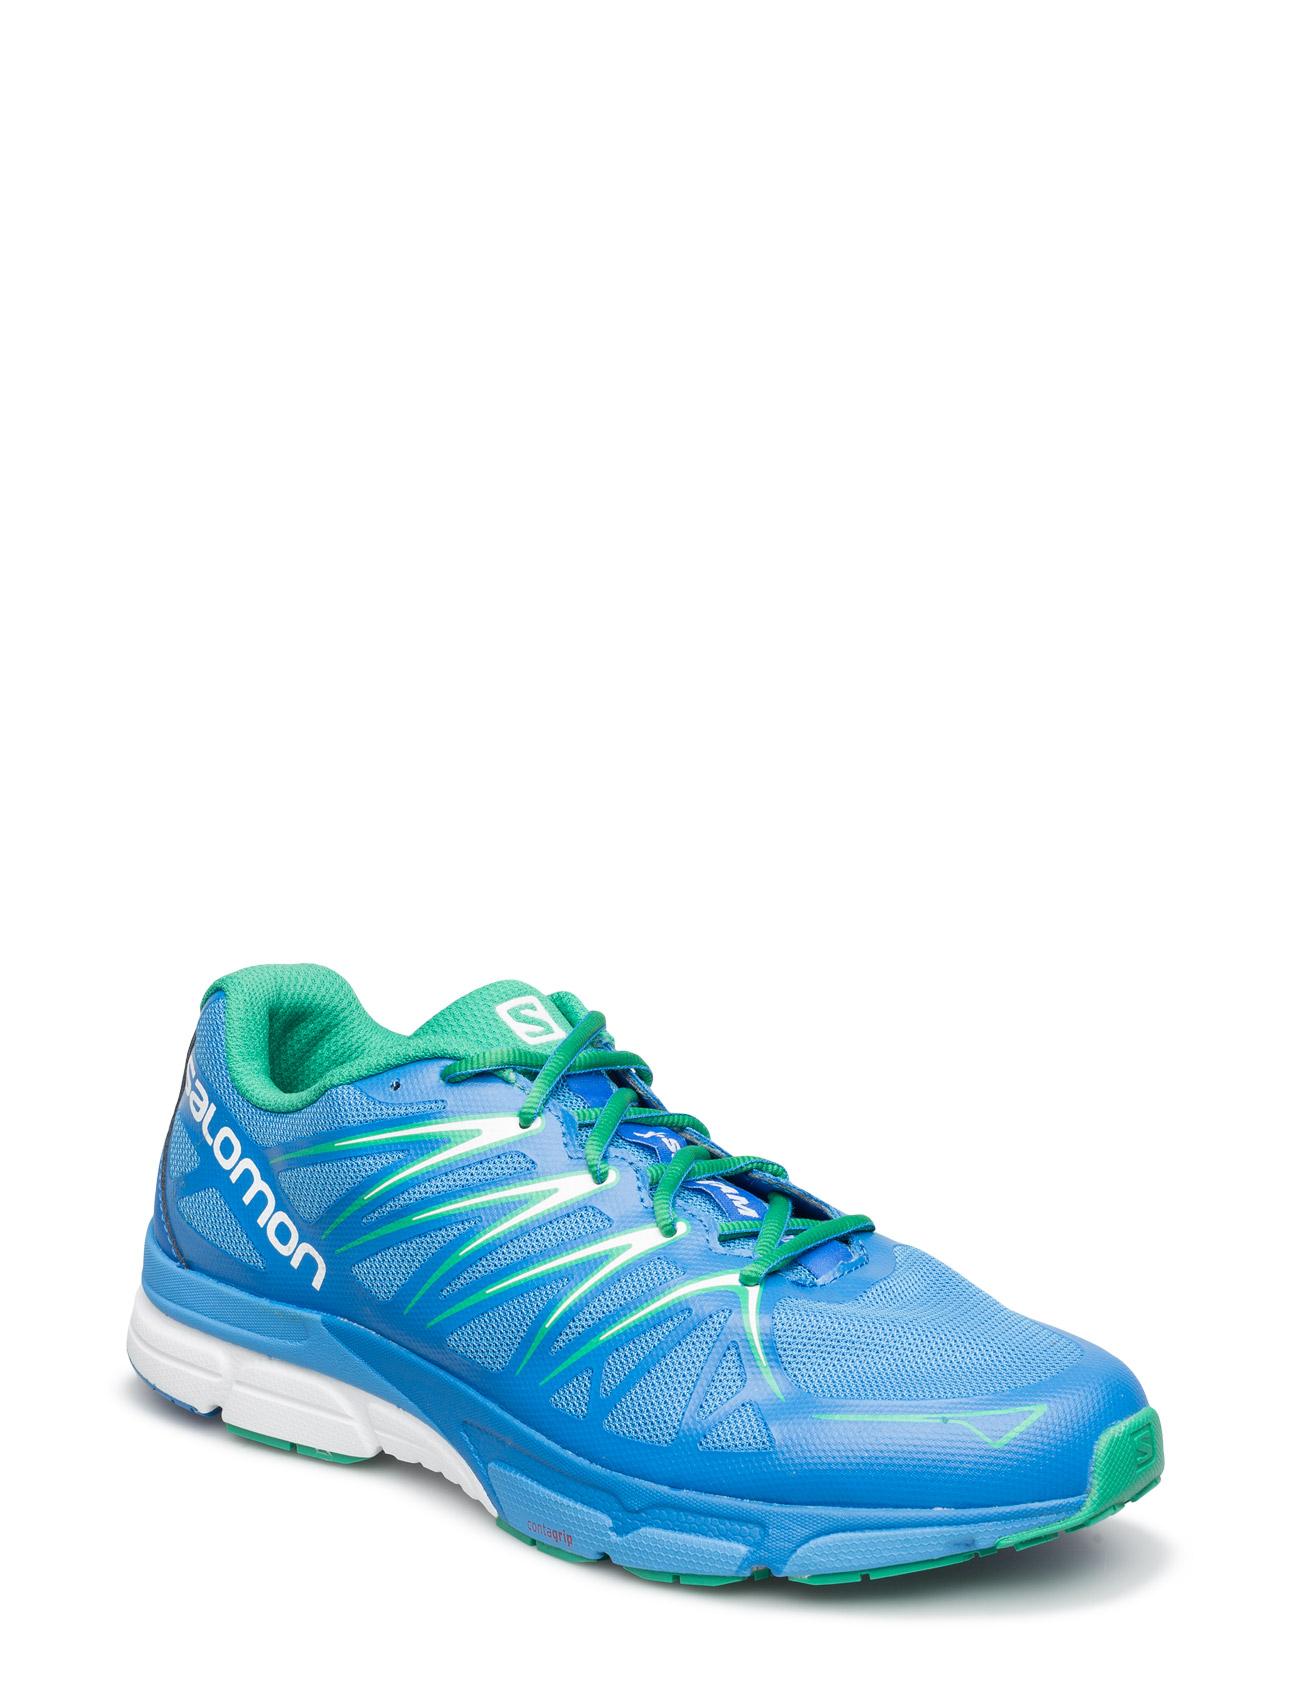 Shoes X-Scream Foil Bl/Bl/Real 6.5 Salomon Sports sko til Herrer i